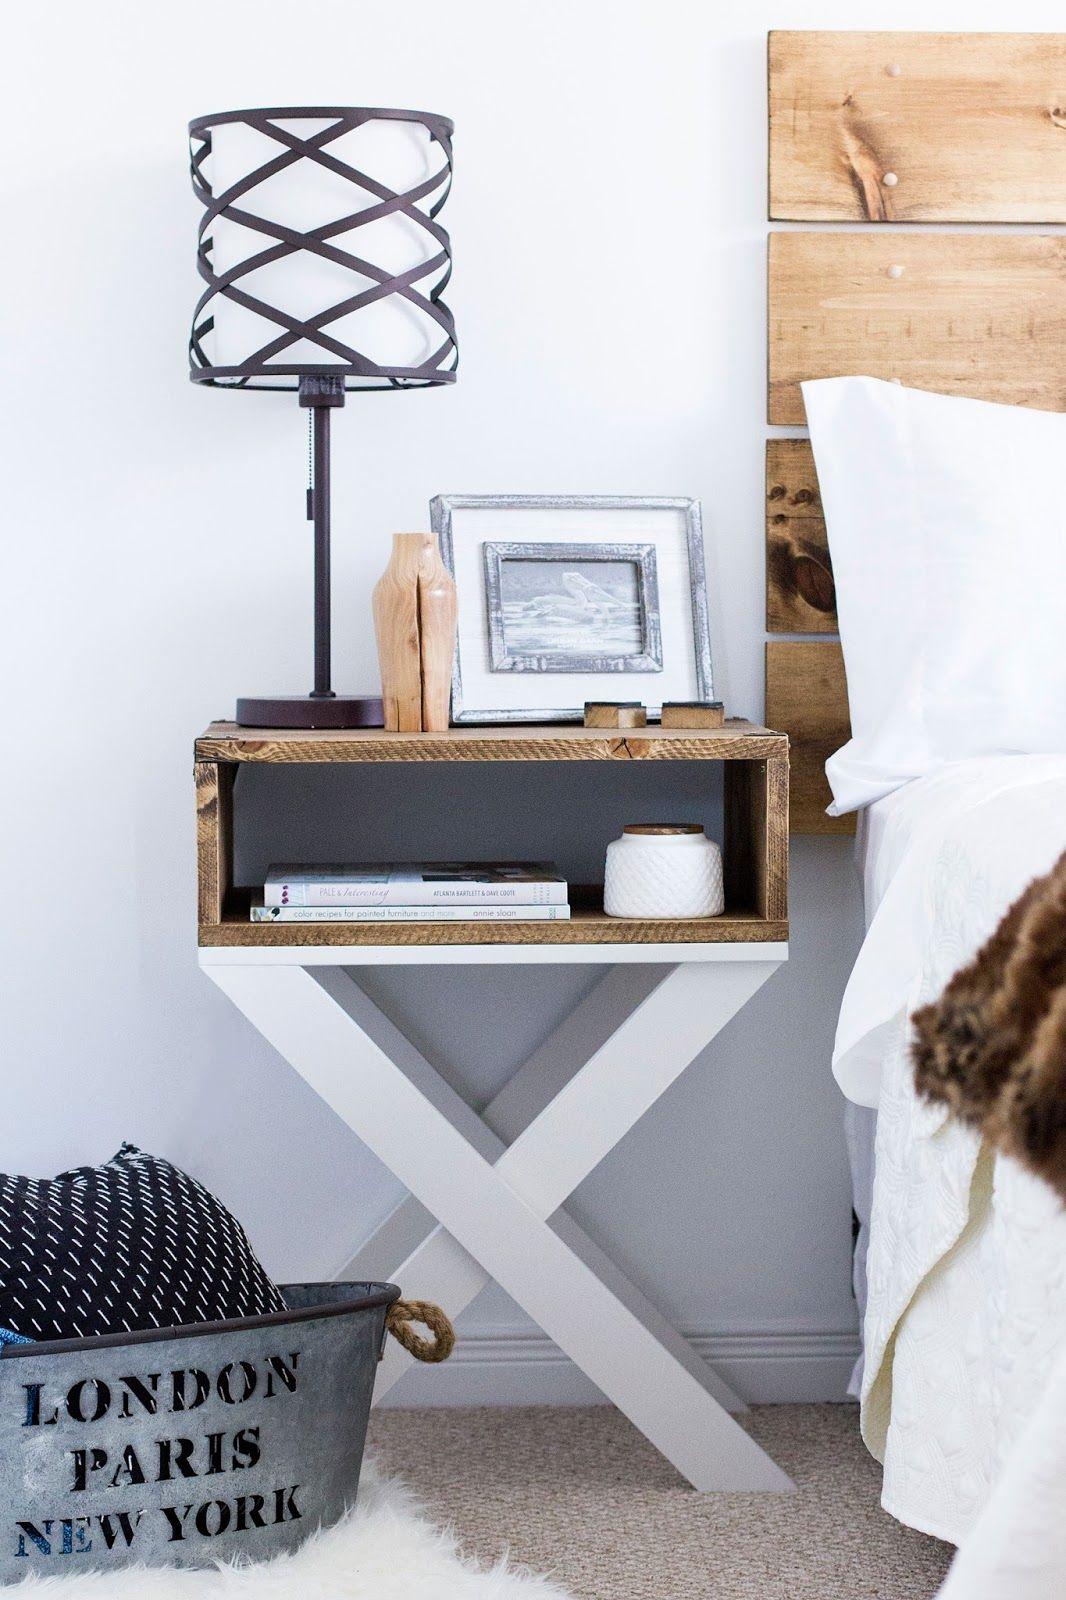 Diy Nighstand Project With X Legs Diy Furniture Bedroom Diy Nightstand Bedroom Diy